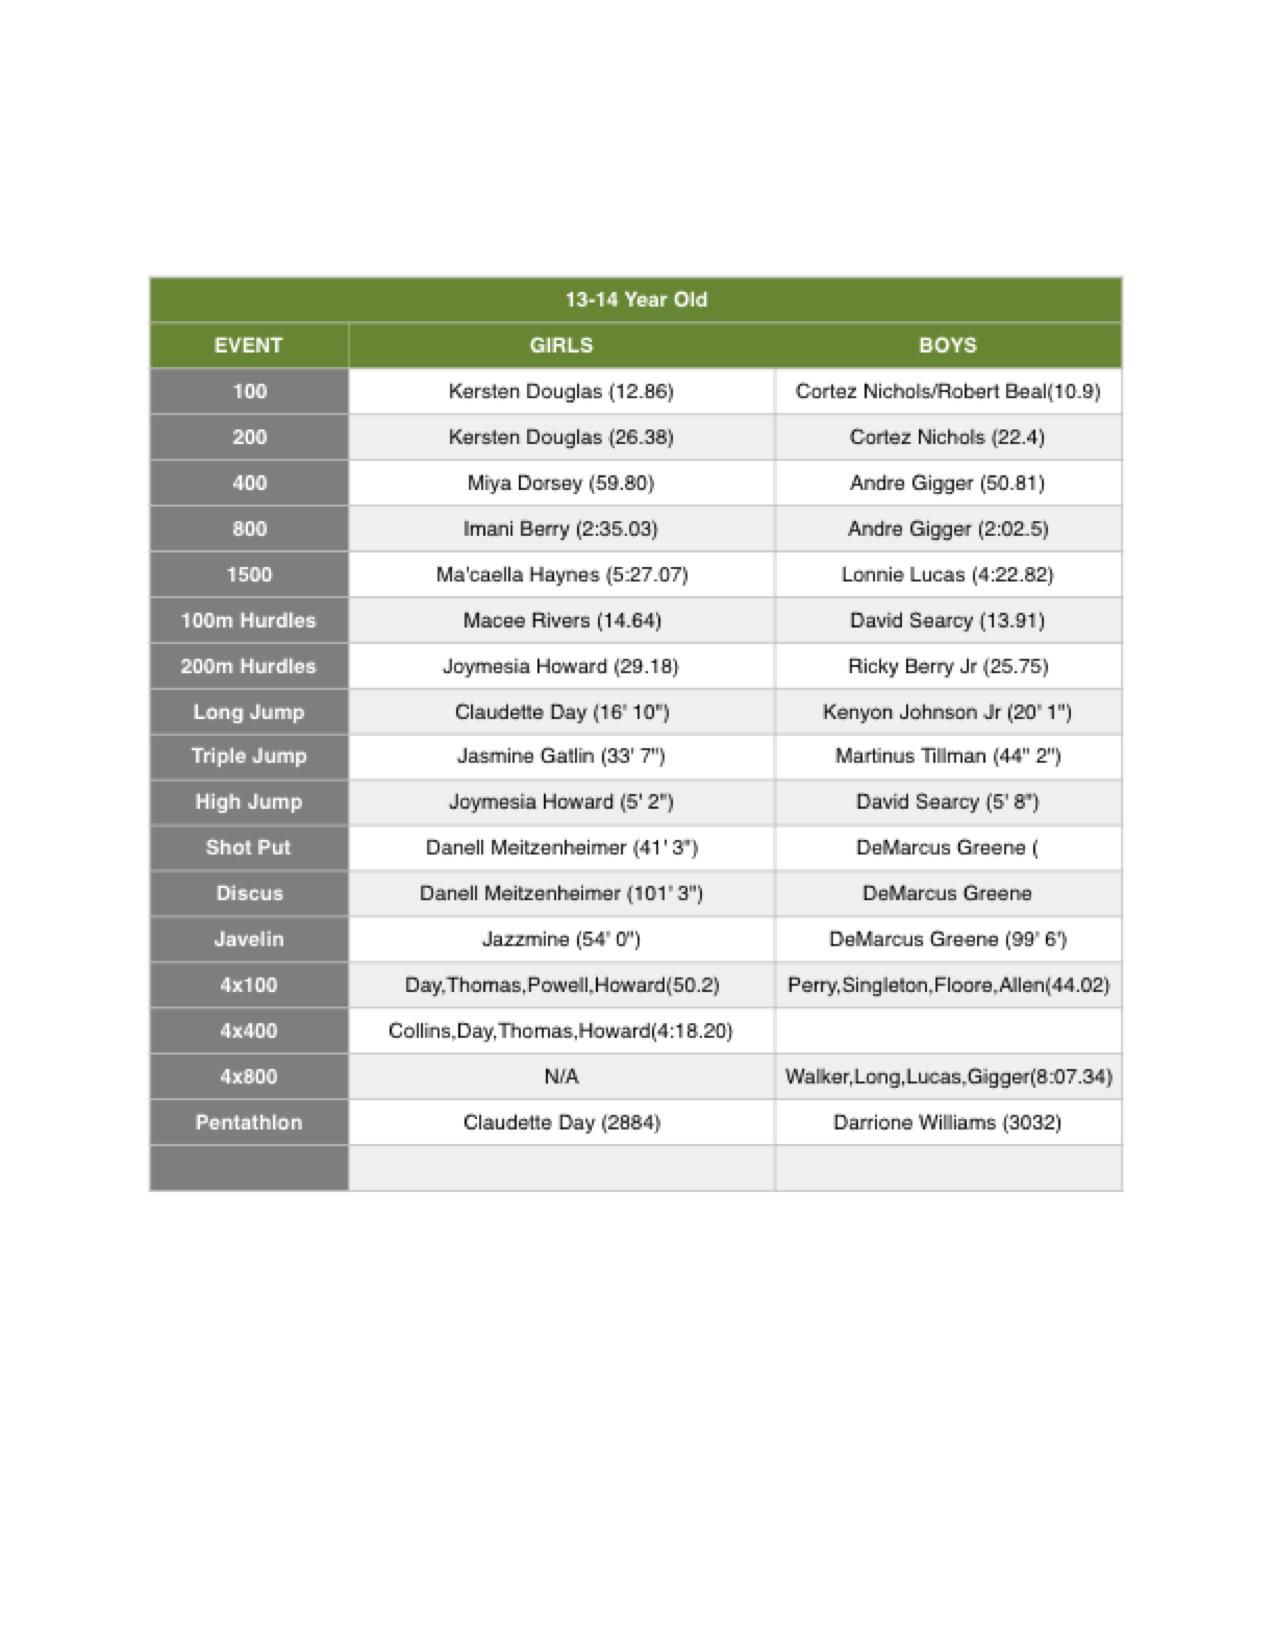 Records 13-14